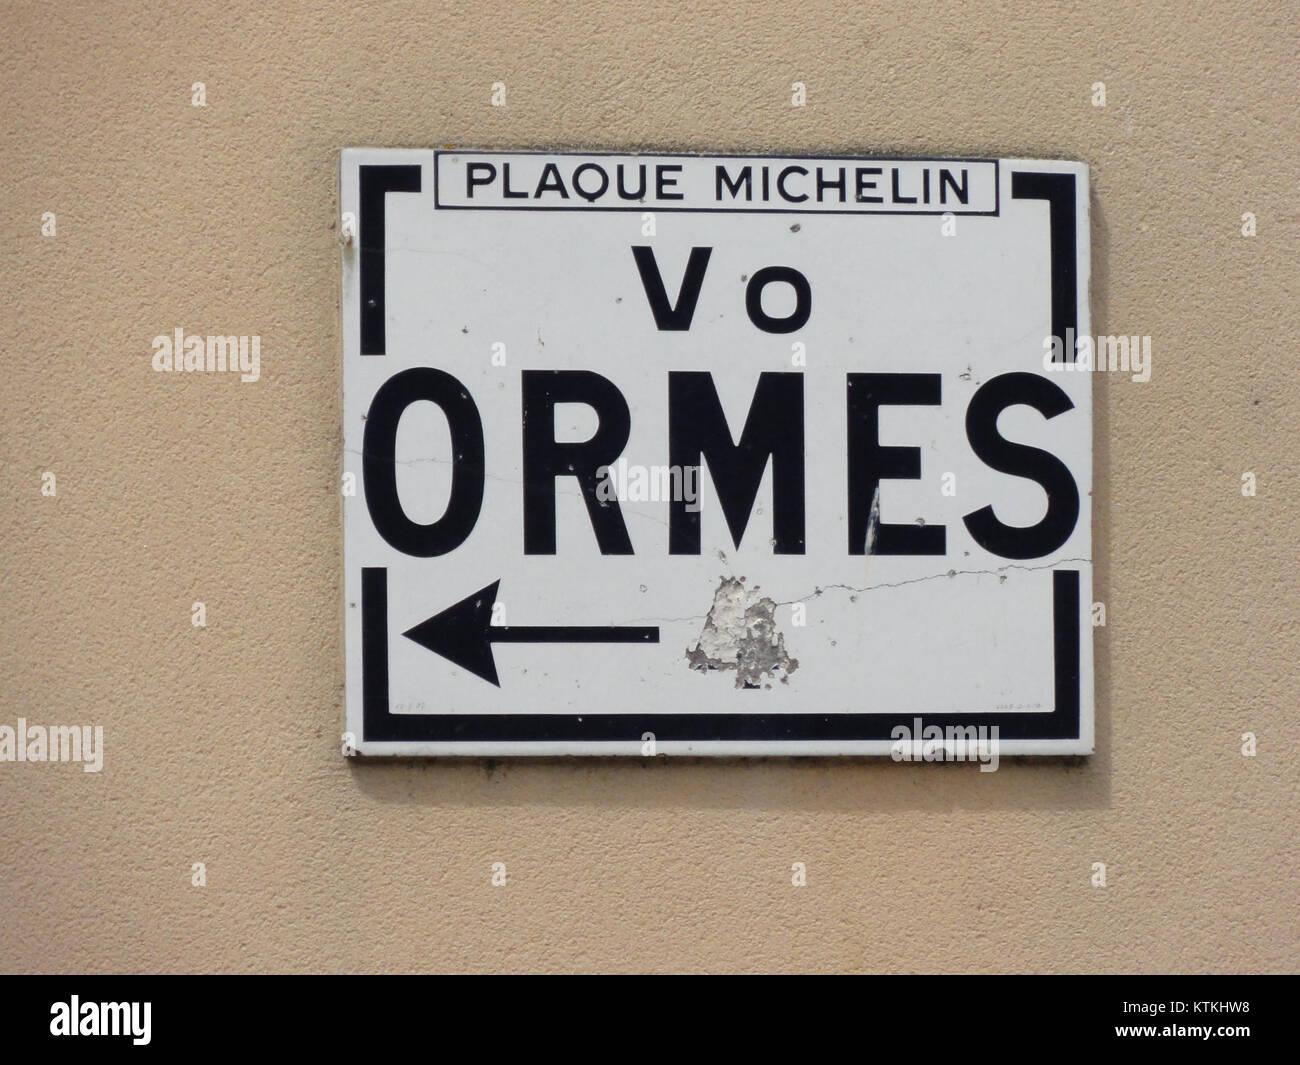 Entfernungsmesser Michelin : Entfernungsmesser michelin elektronik trends technik kaufen im